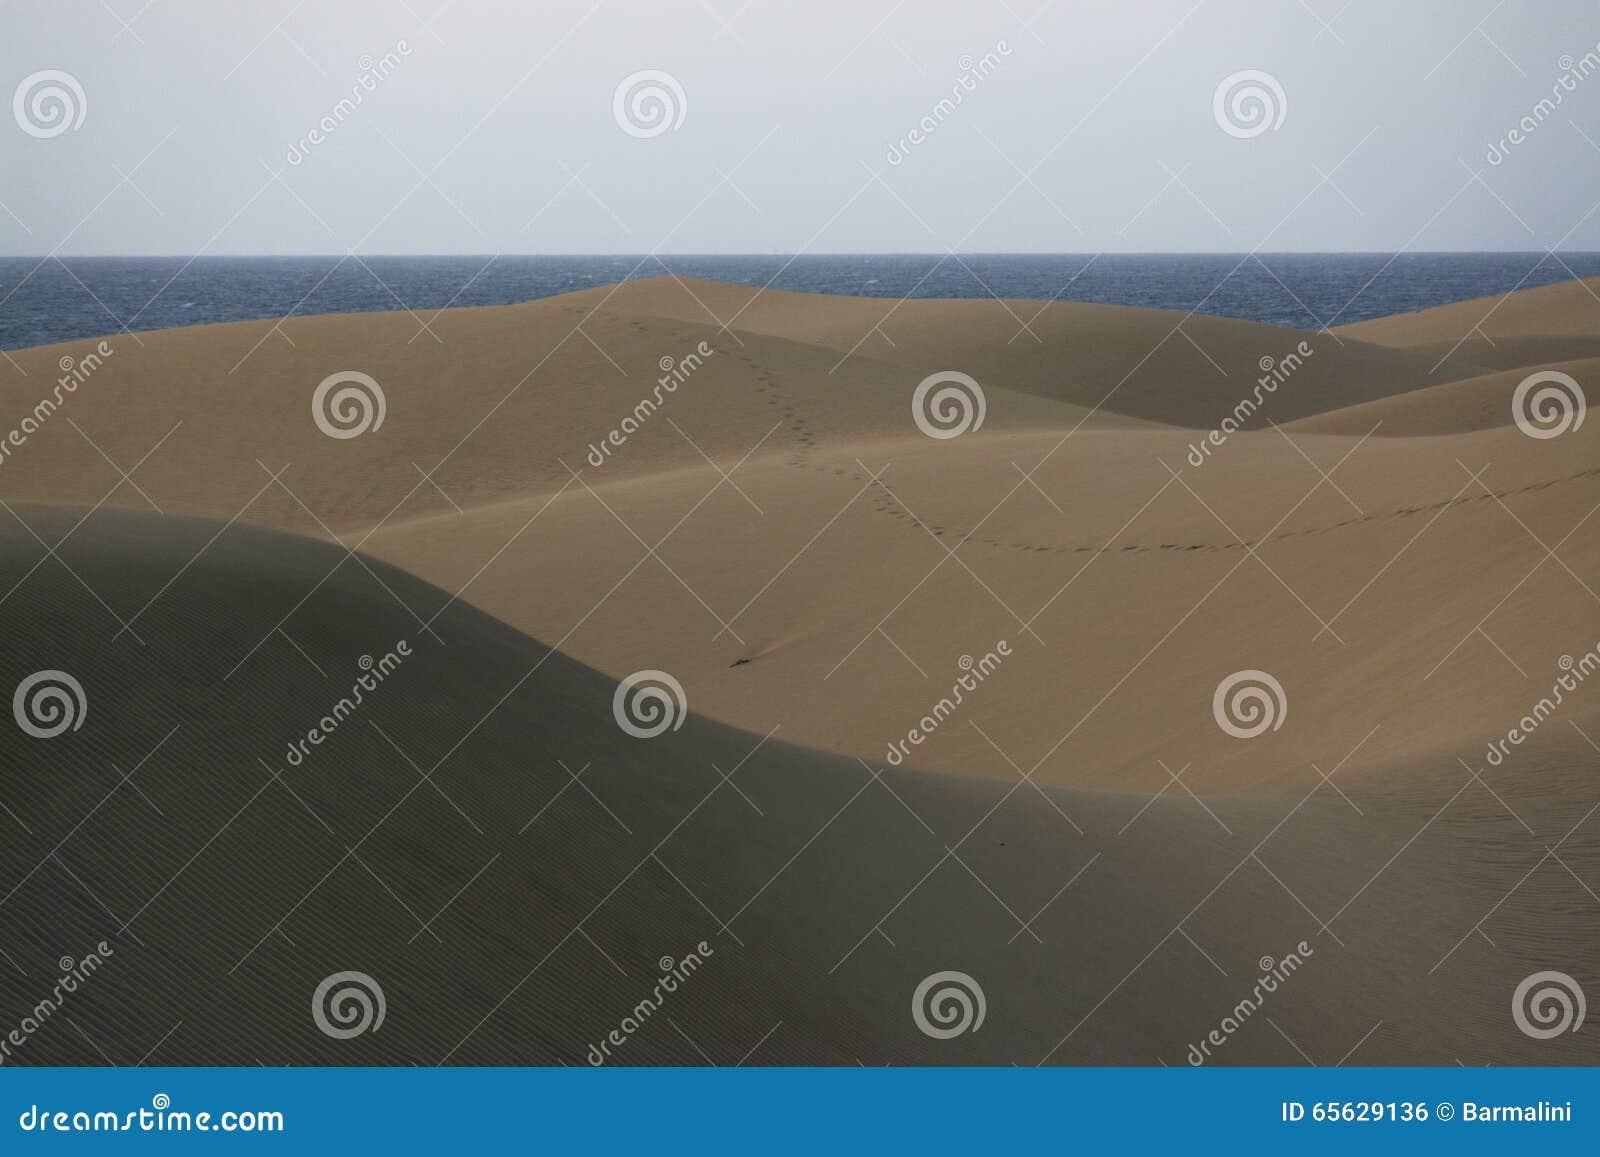 Dunes de sable et océan, Maspalomas, mamie Canaria